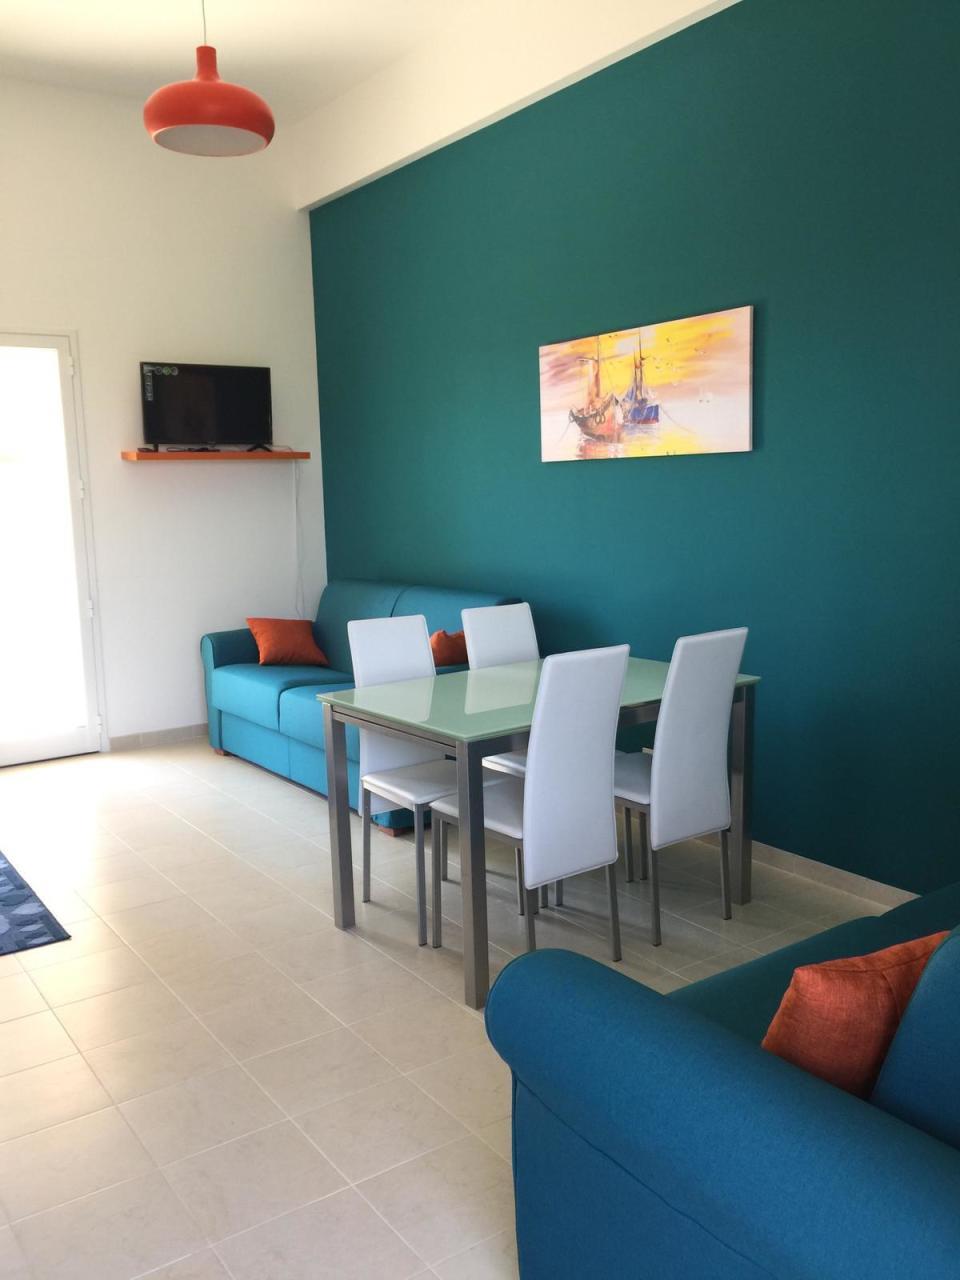 Appartamento - Trilocale a Marina Di Ragusa, Ragusa